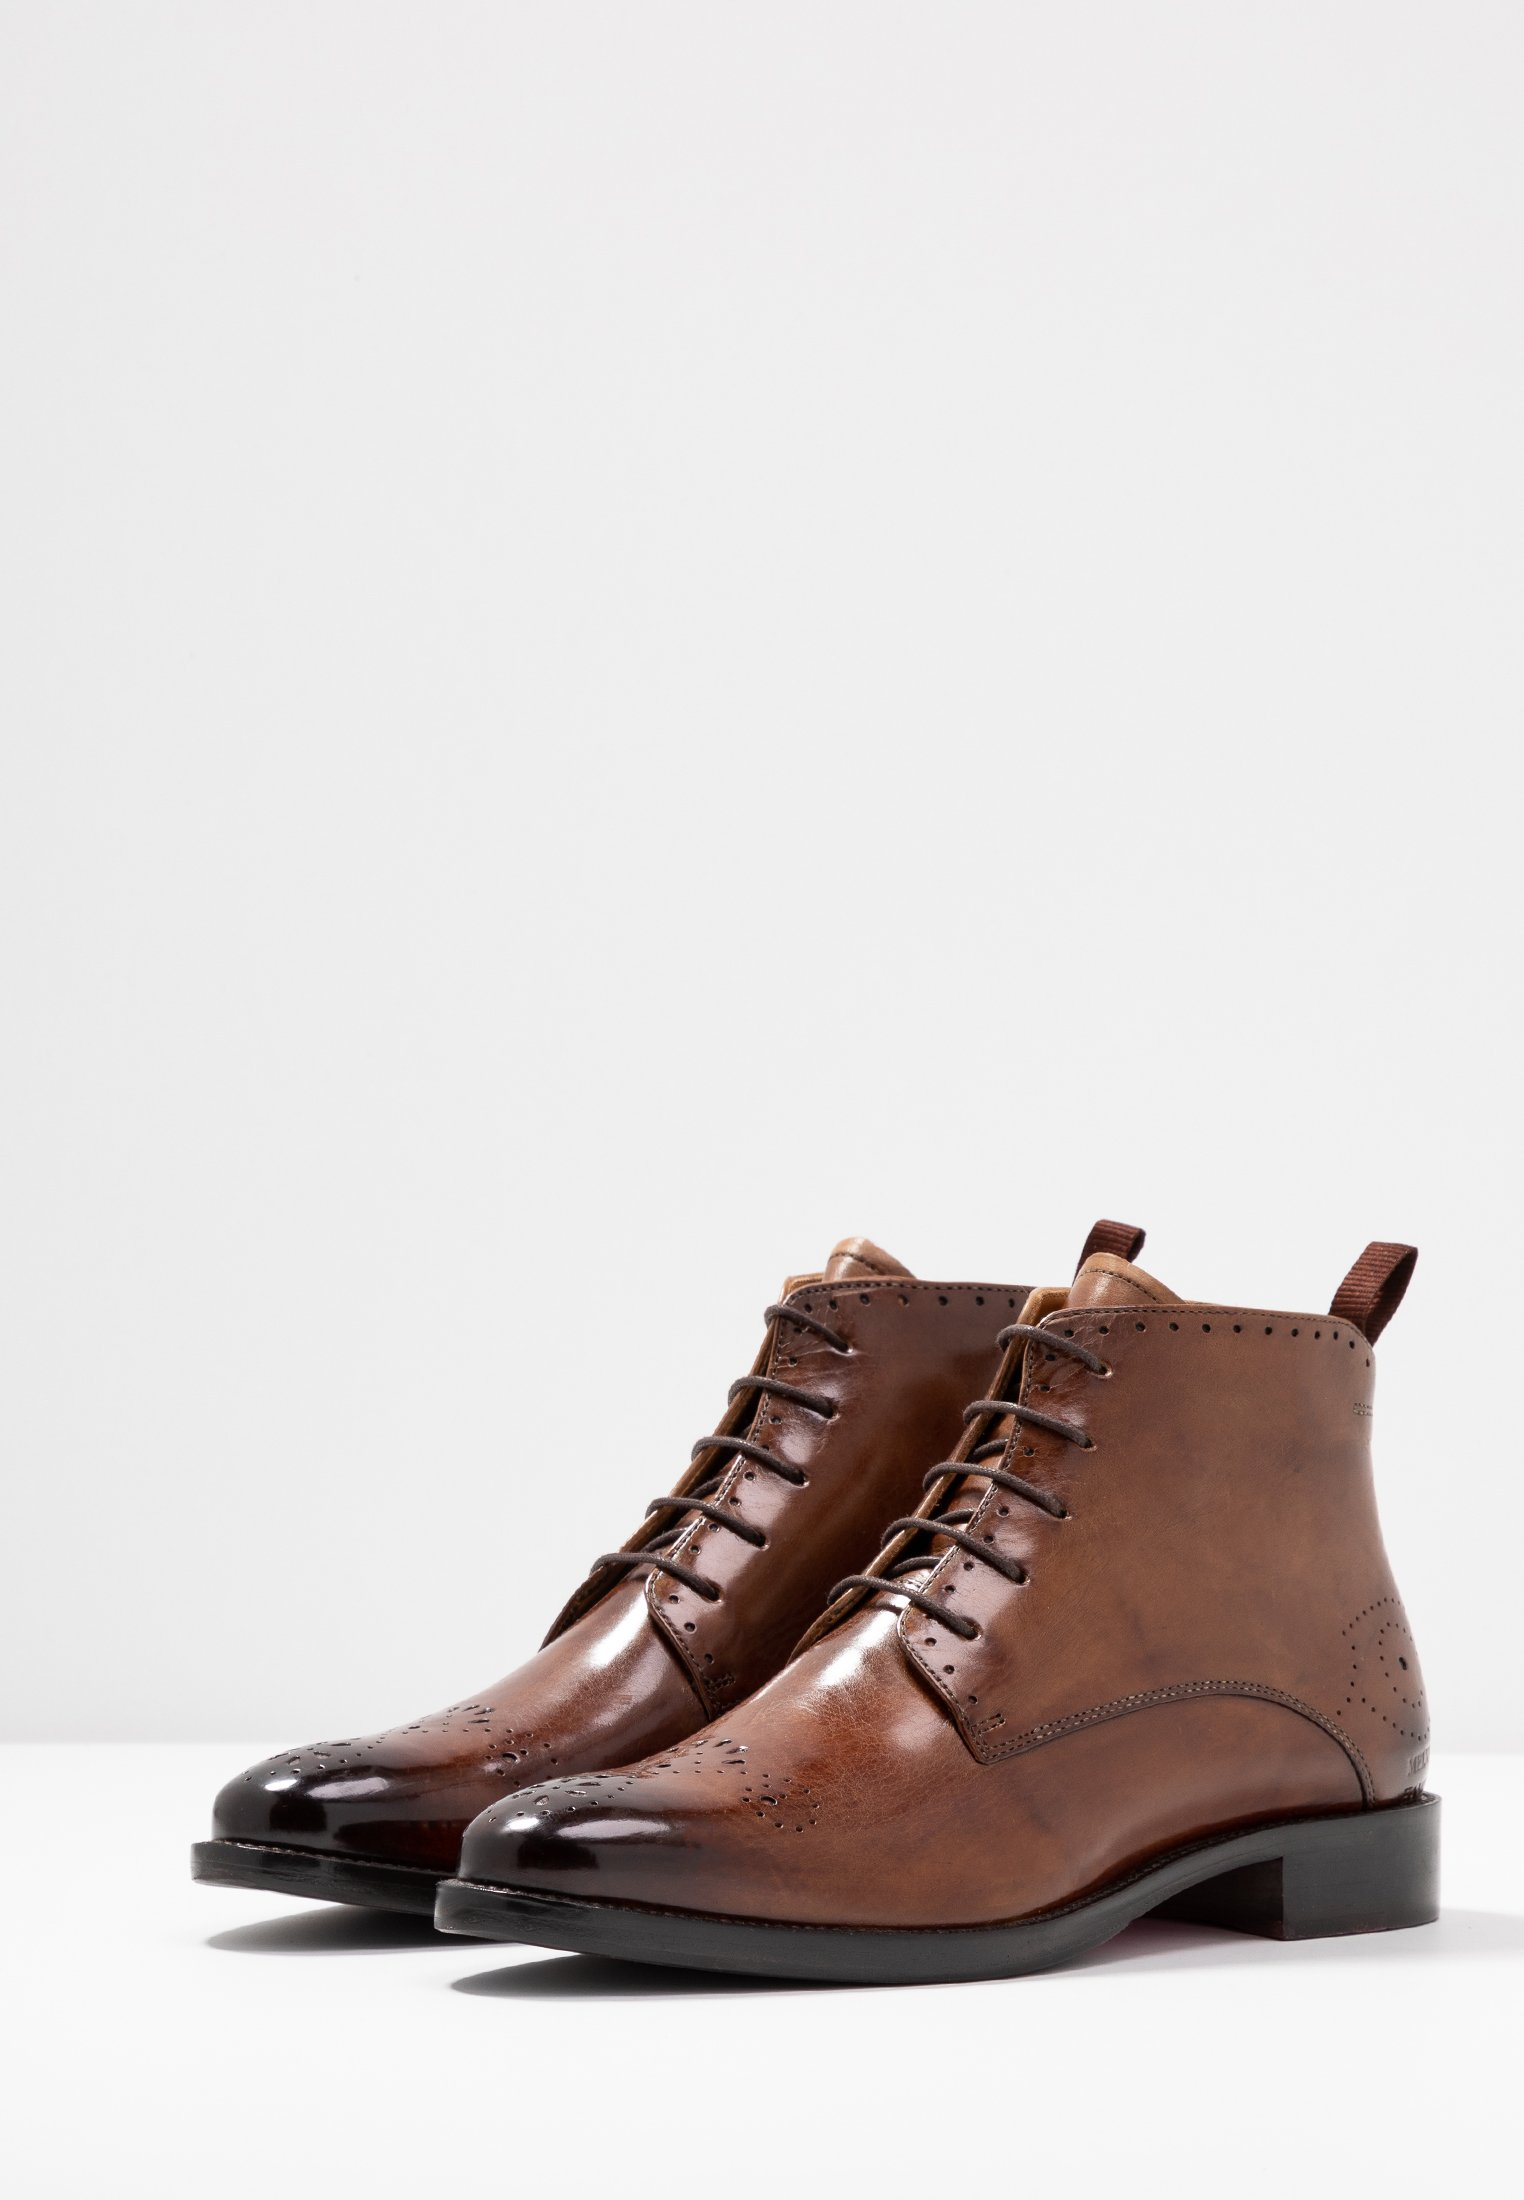 Melvin & Hamilton BETTY - Ankle Boot - tobacco - Black Friday